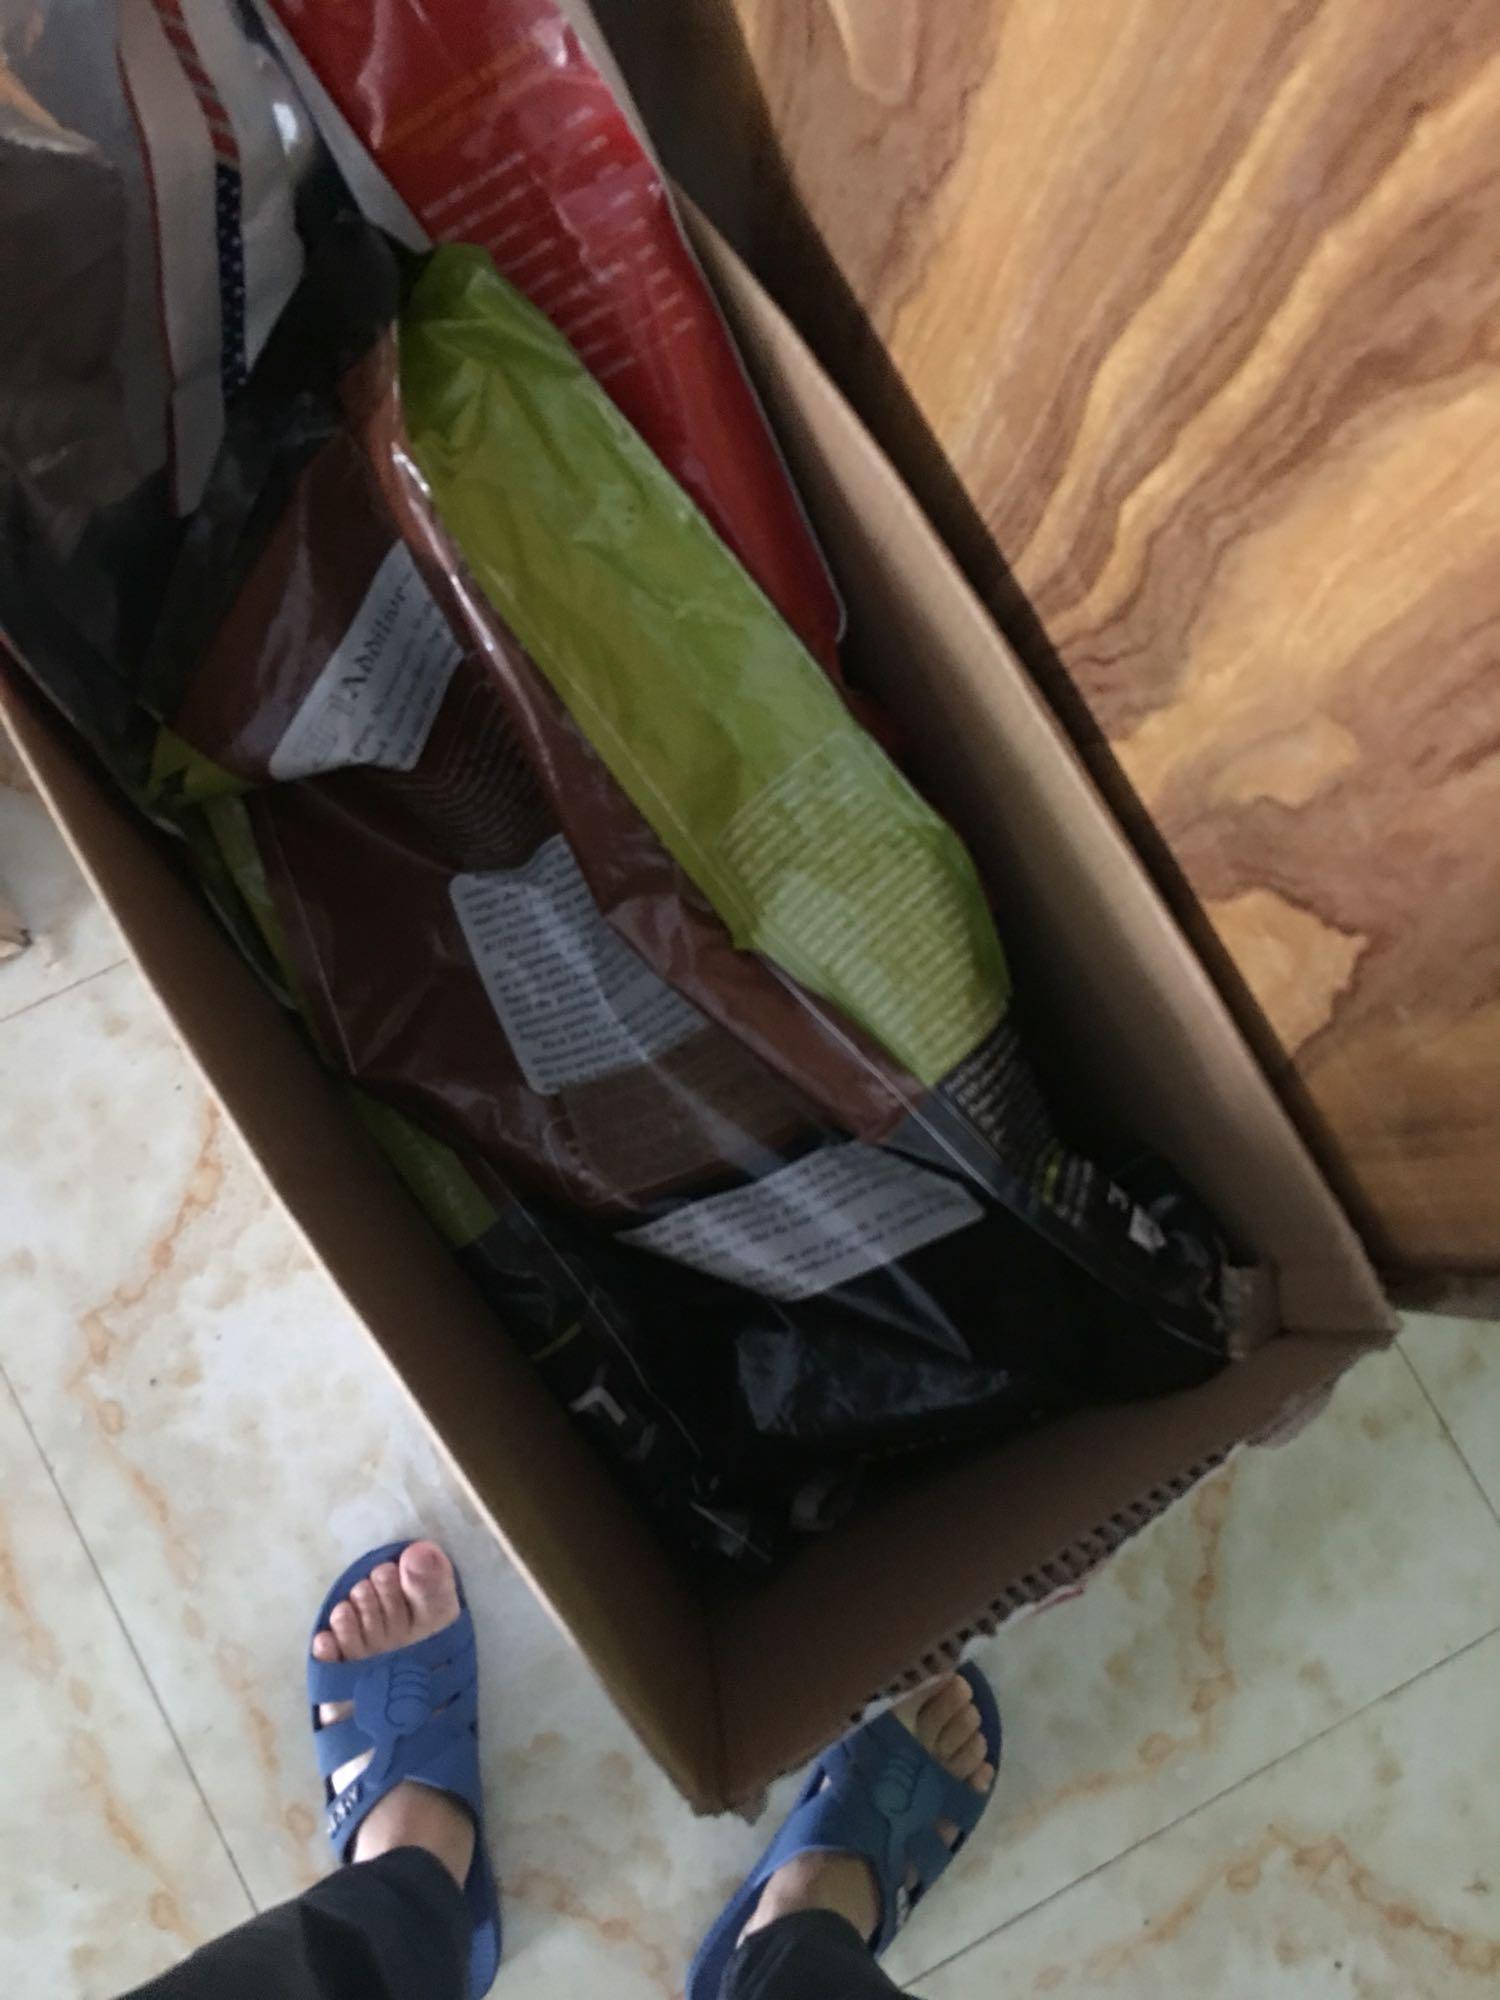 jordans 13 blue and green 00212014 for-cheap